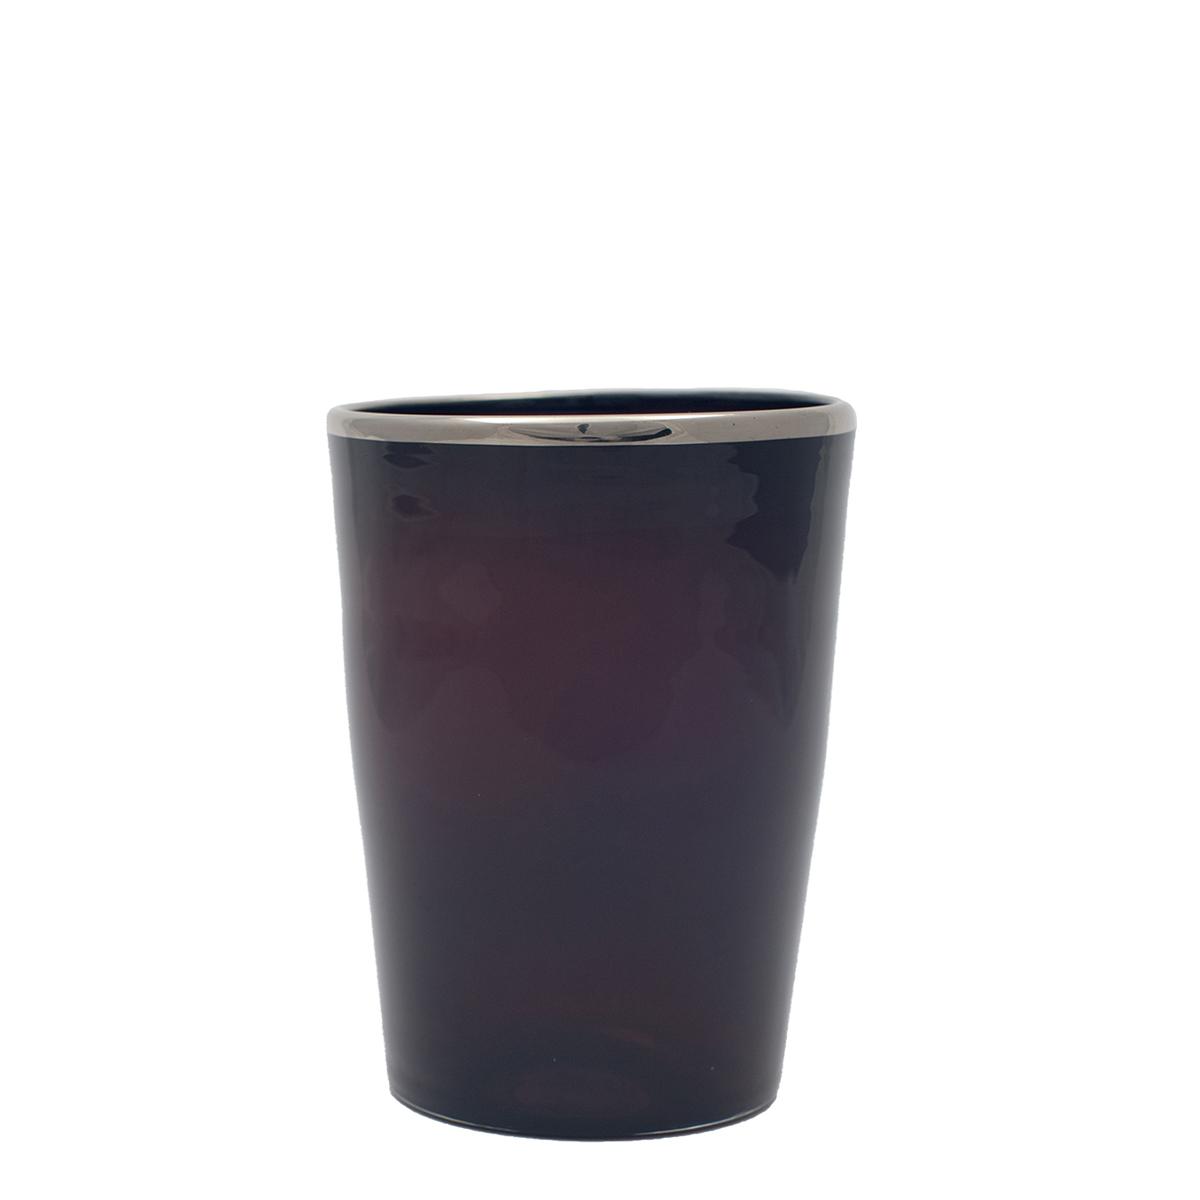 vaso_glass_murano_design_wine_venice_handmade_giberto